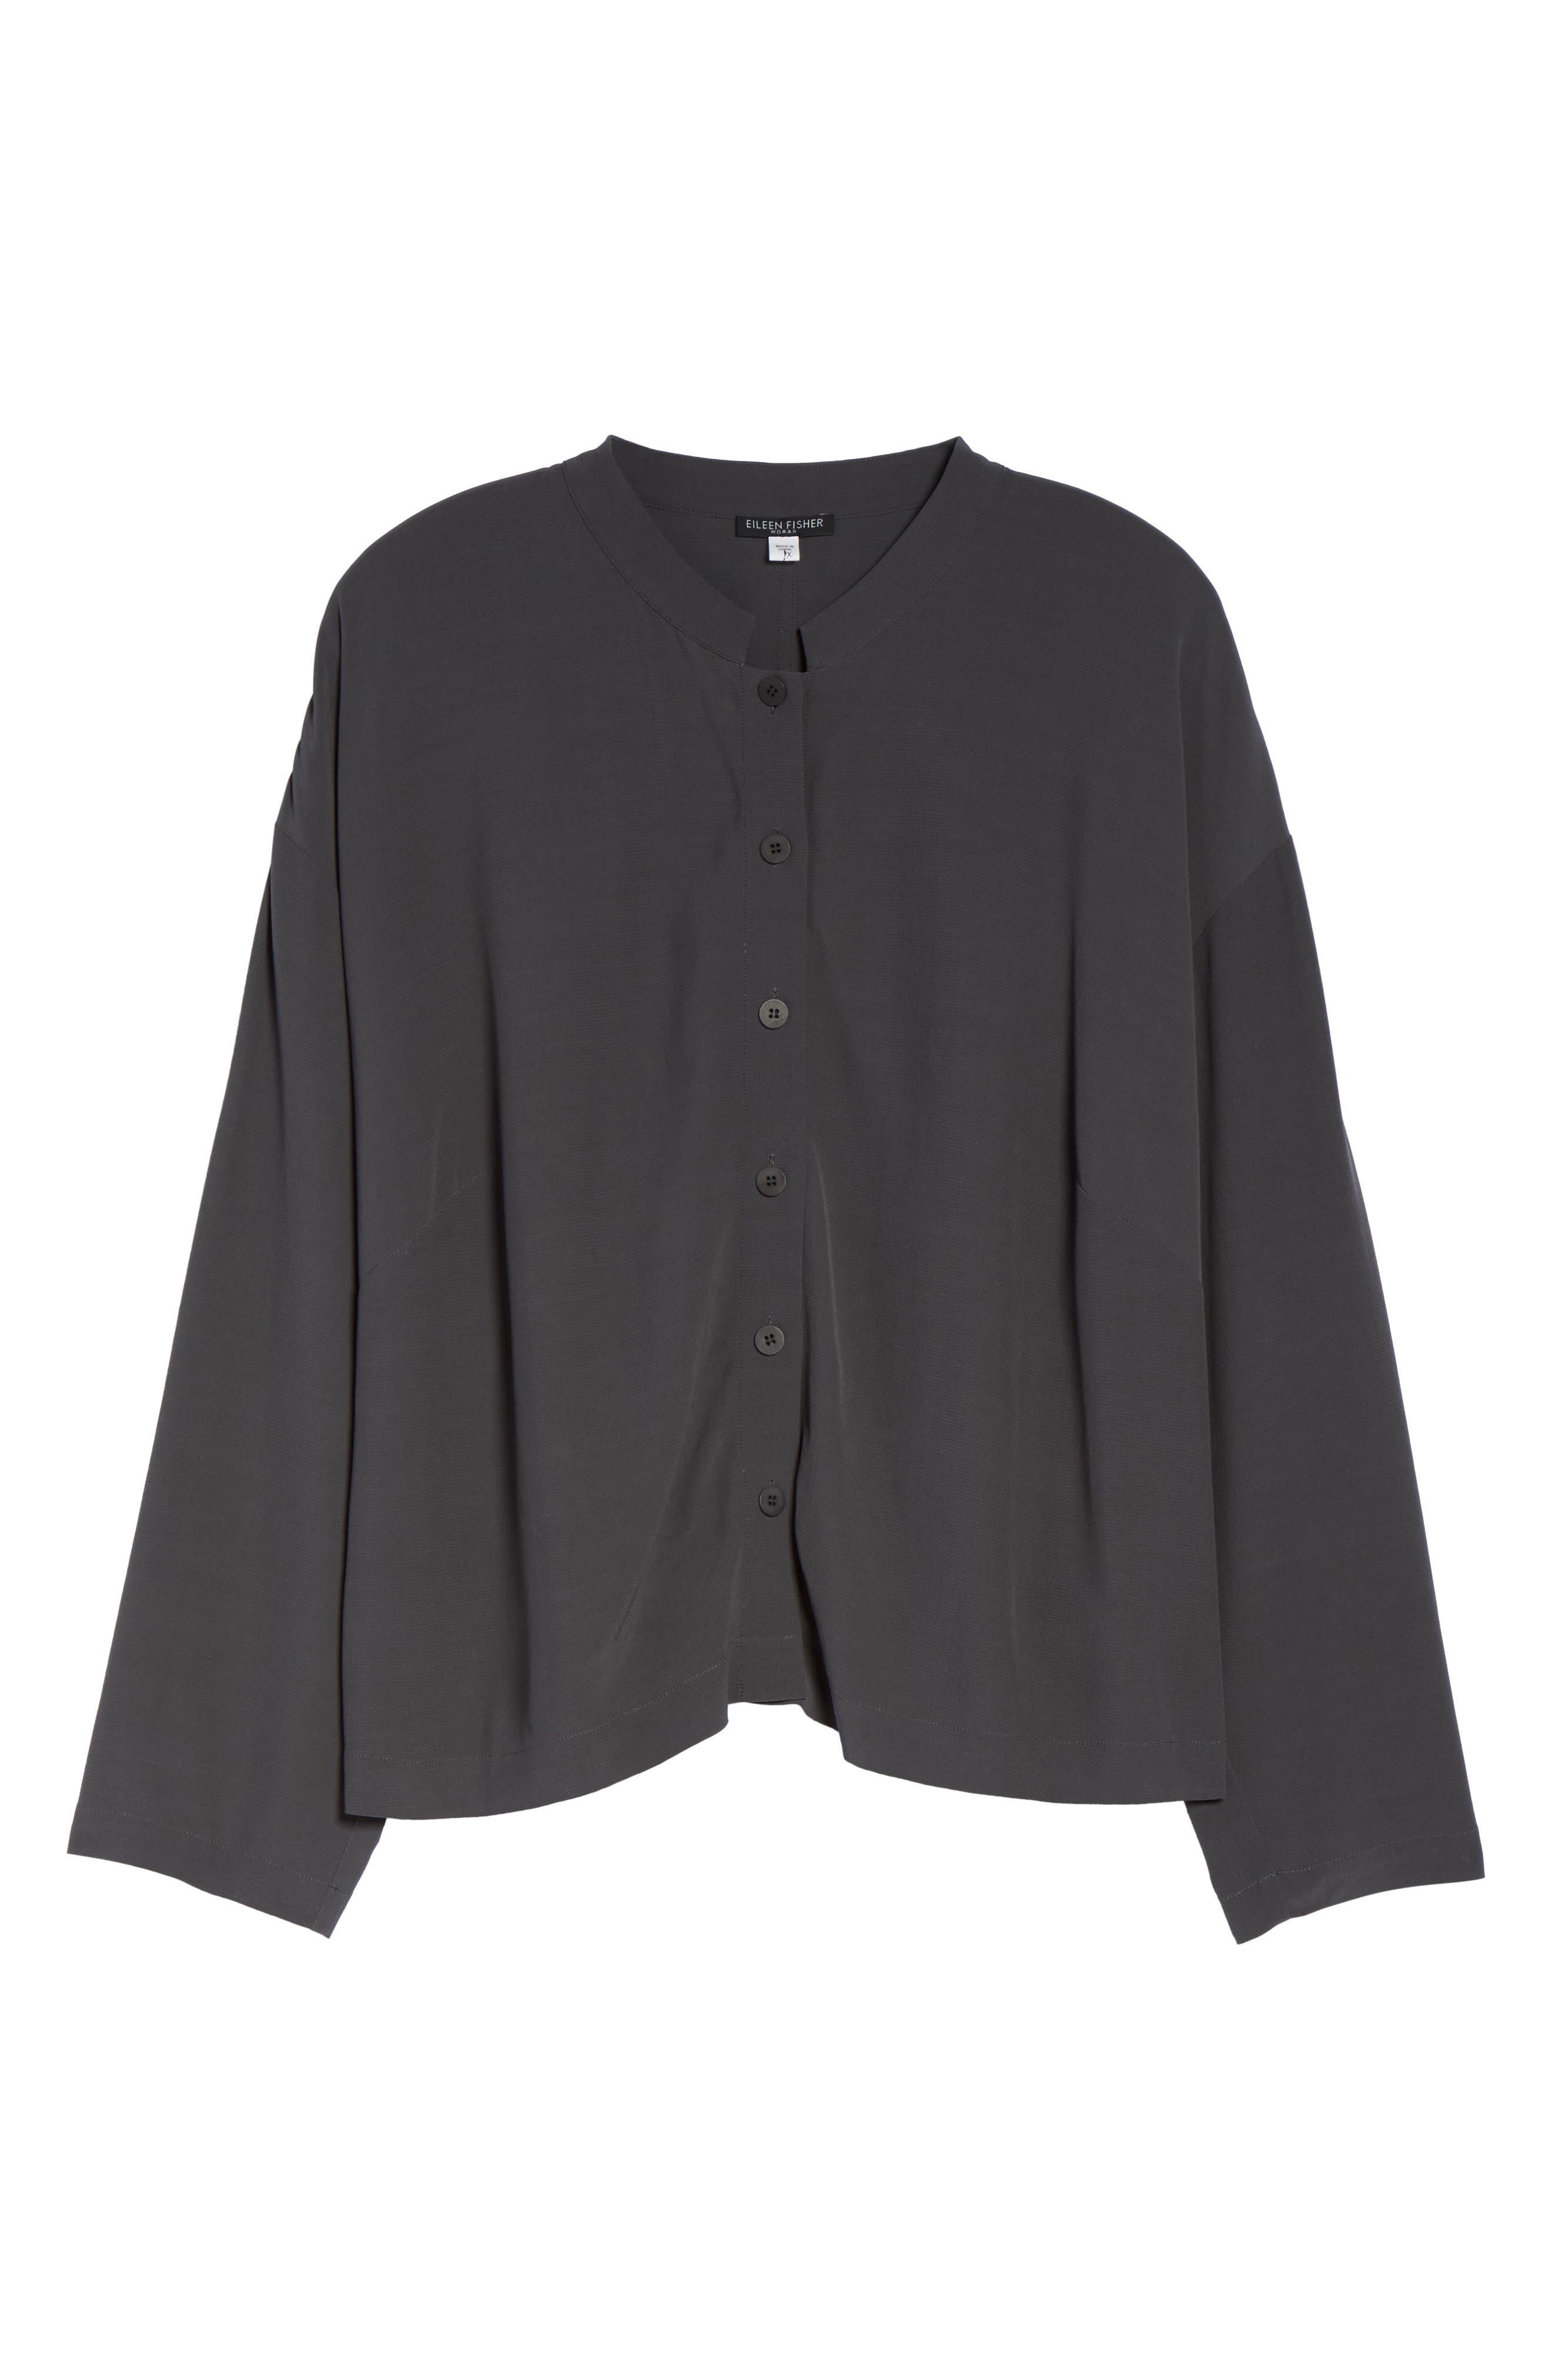 Eileen Fisher Mandarin Collar Boxy Top (Plus Size)